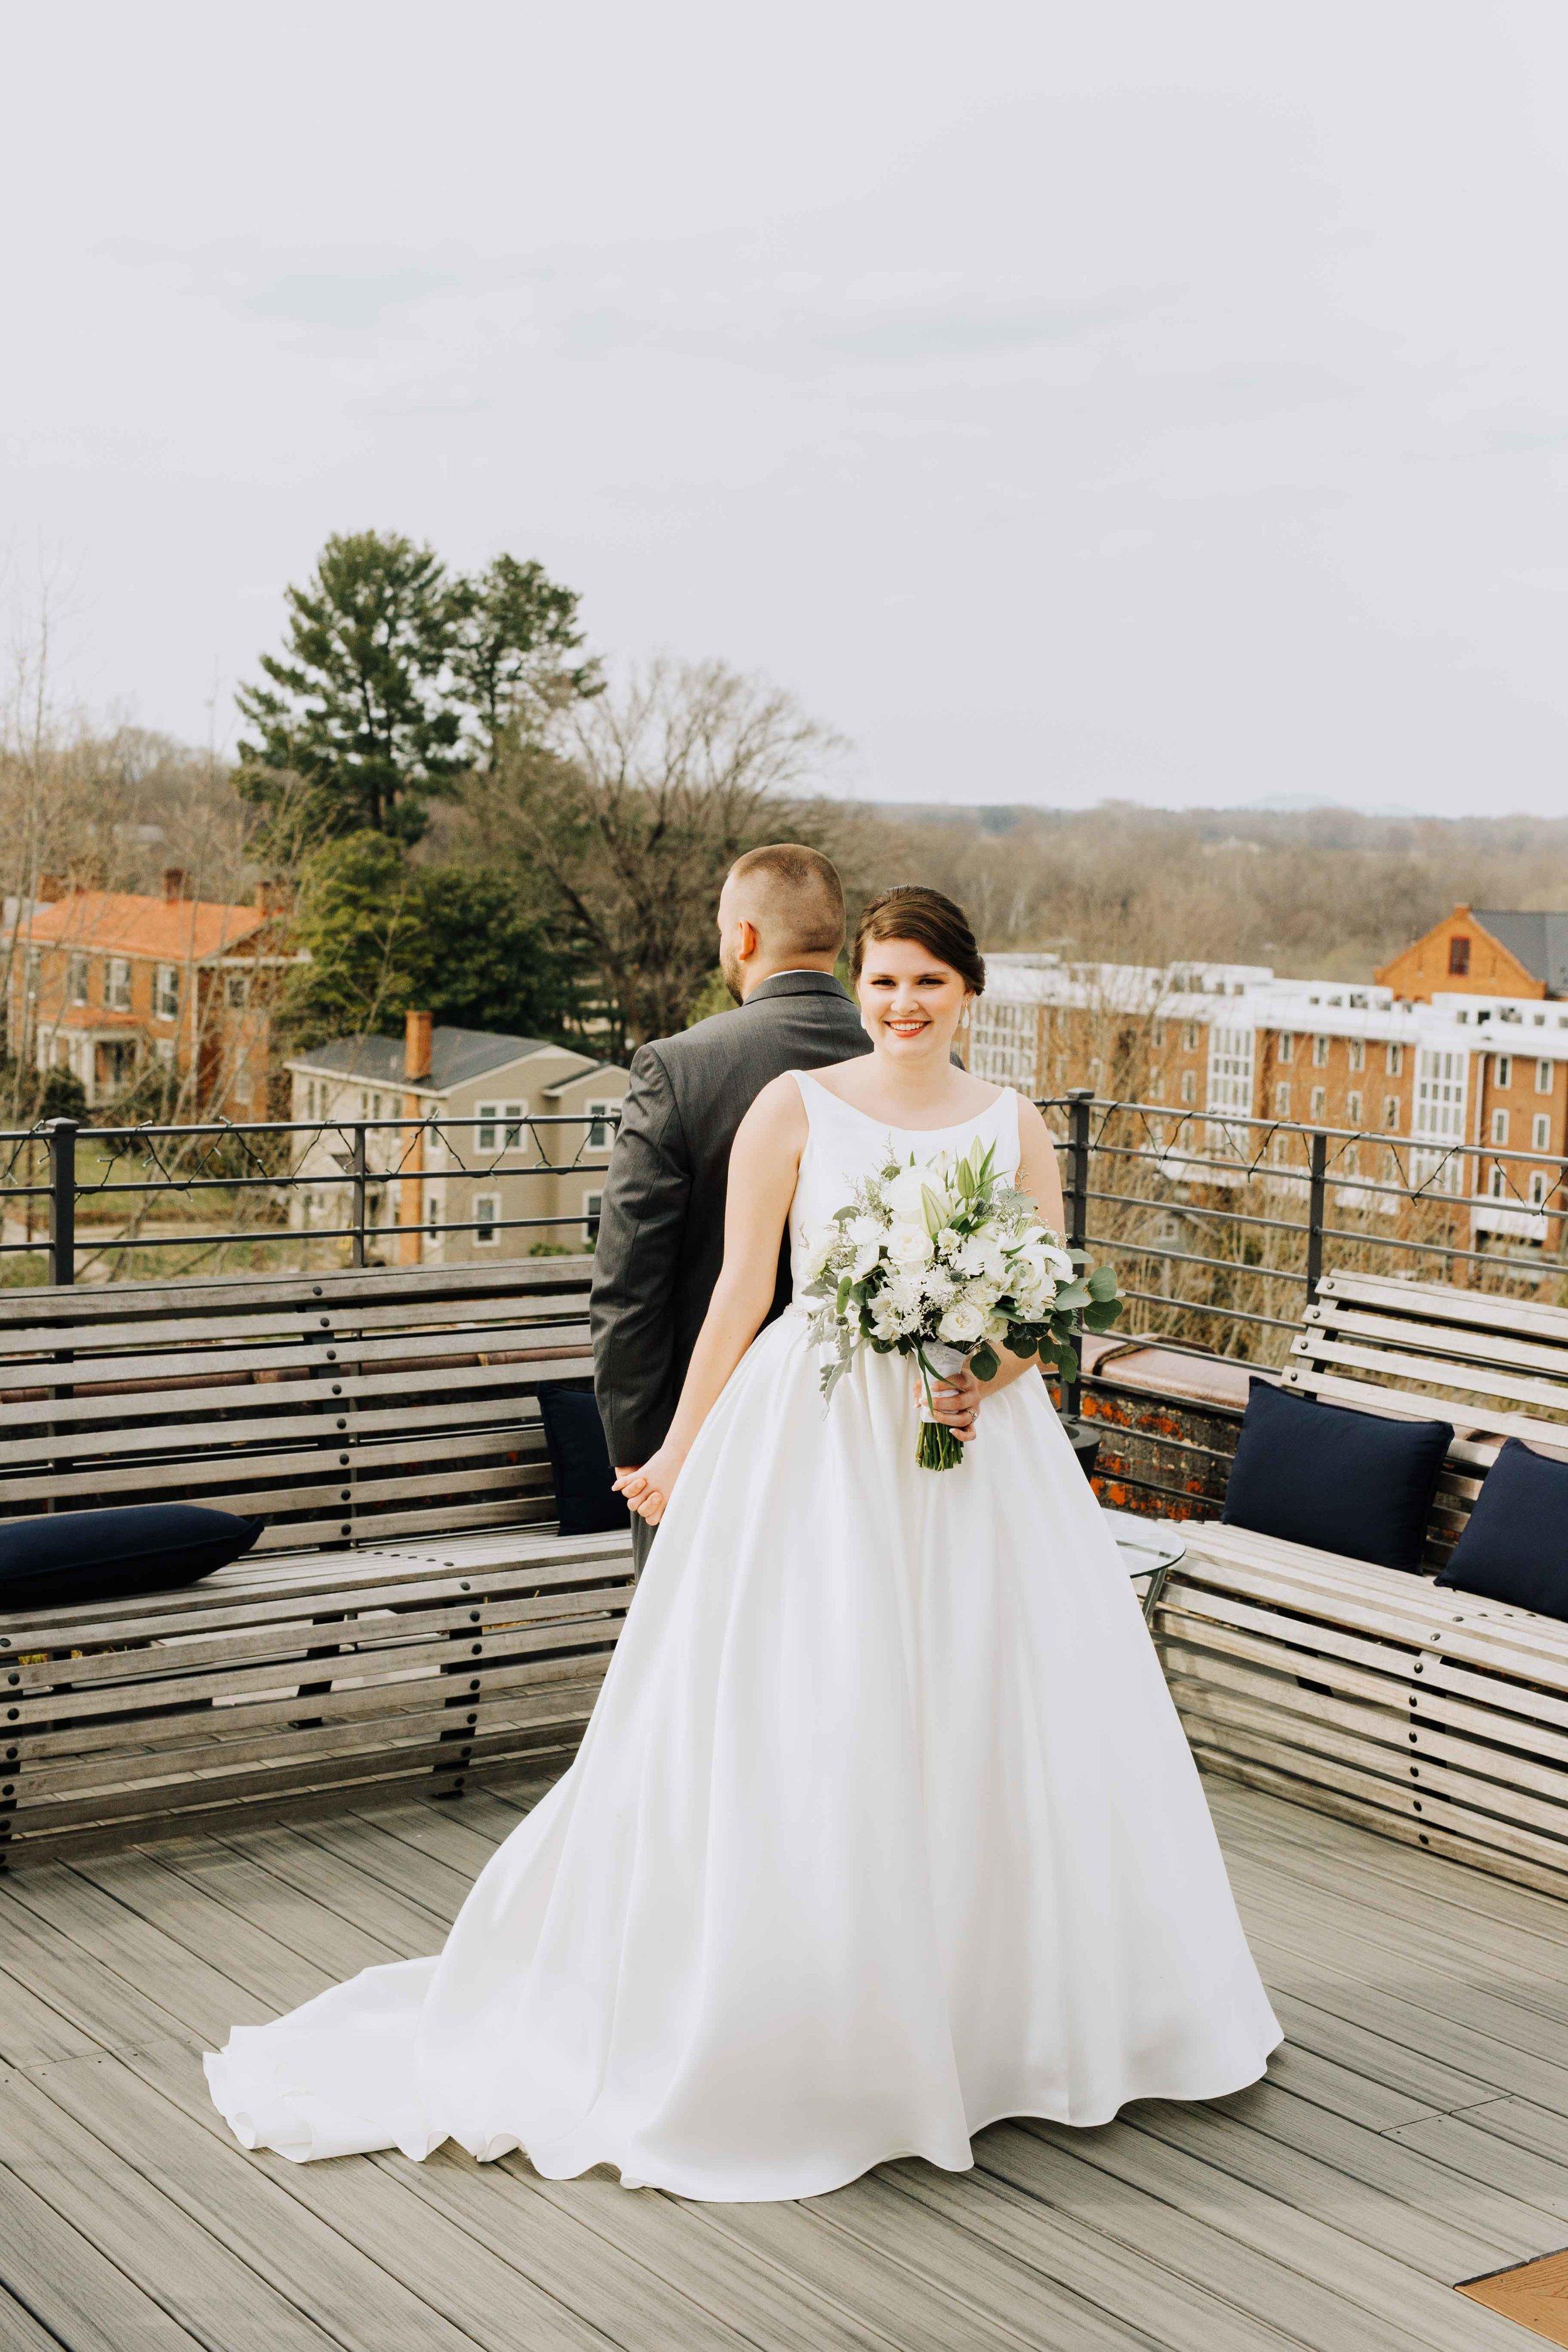 Farmville-Virginia-Wedding-Hotel-Weynoke-Downtown-Jacqueline-Waters-Photography-Detailed- (516).jpg